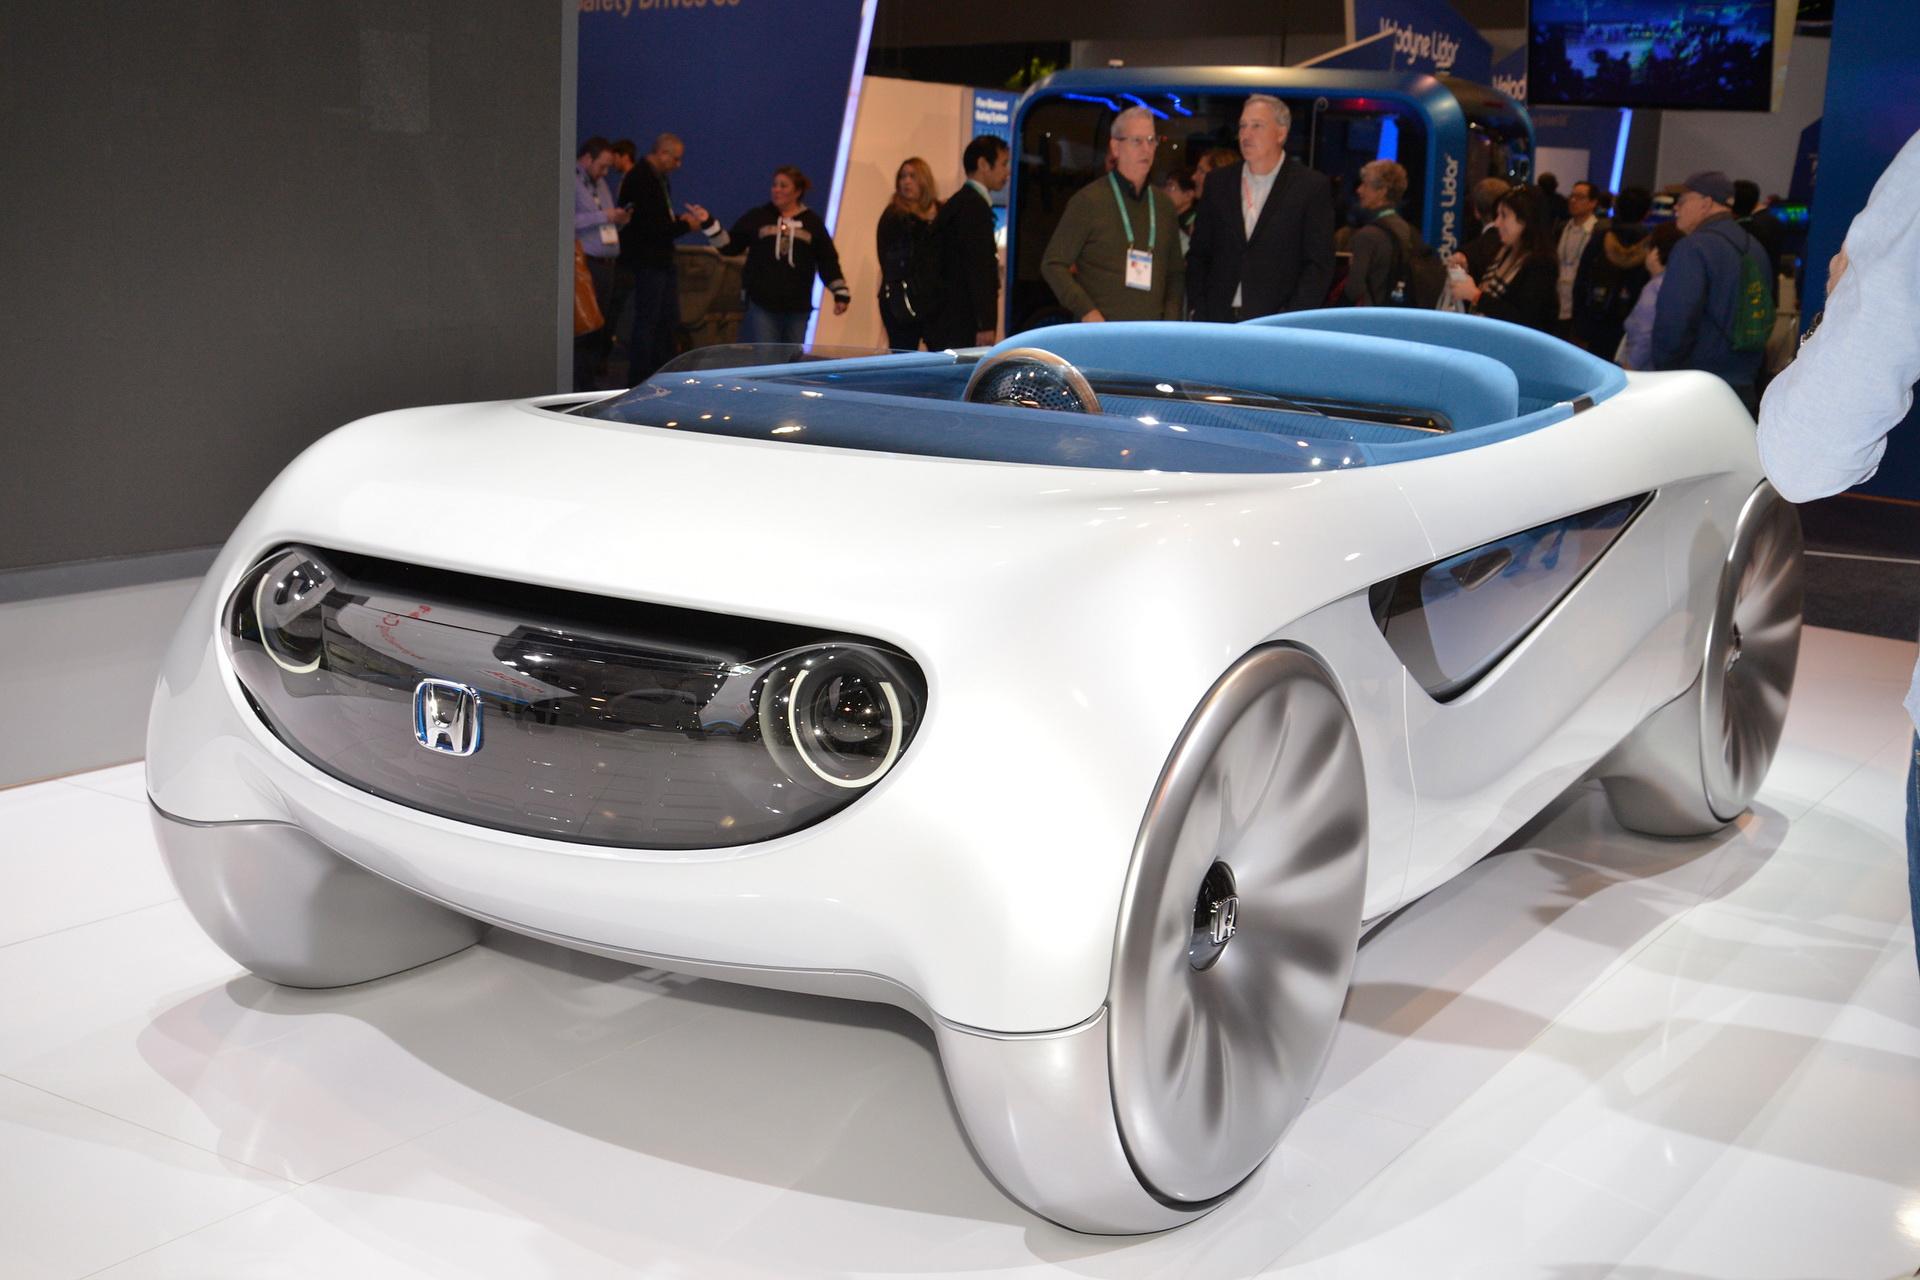 honda-augmented-driving-concept-ces-livepics-1.jpg